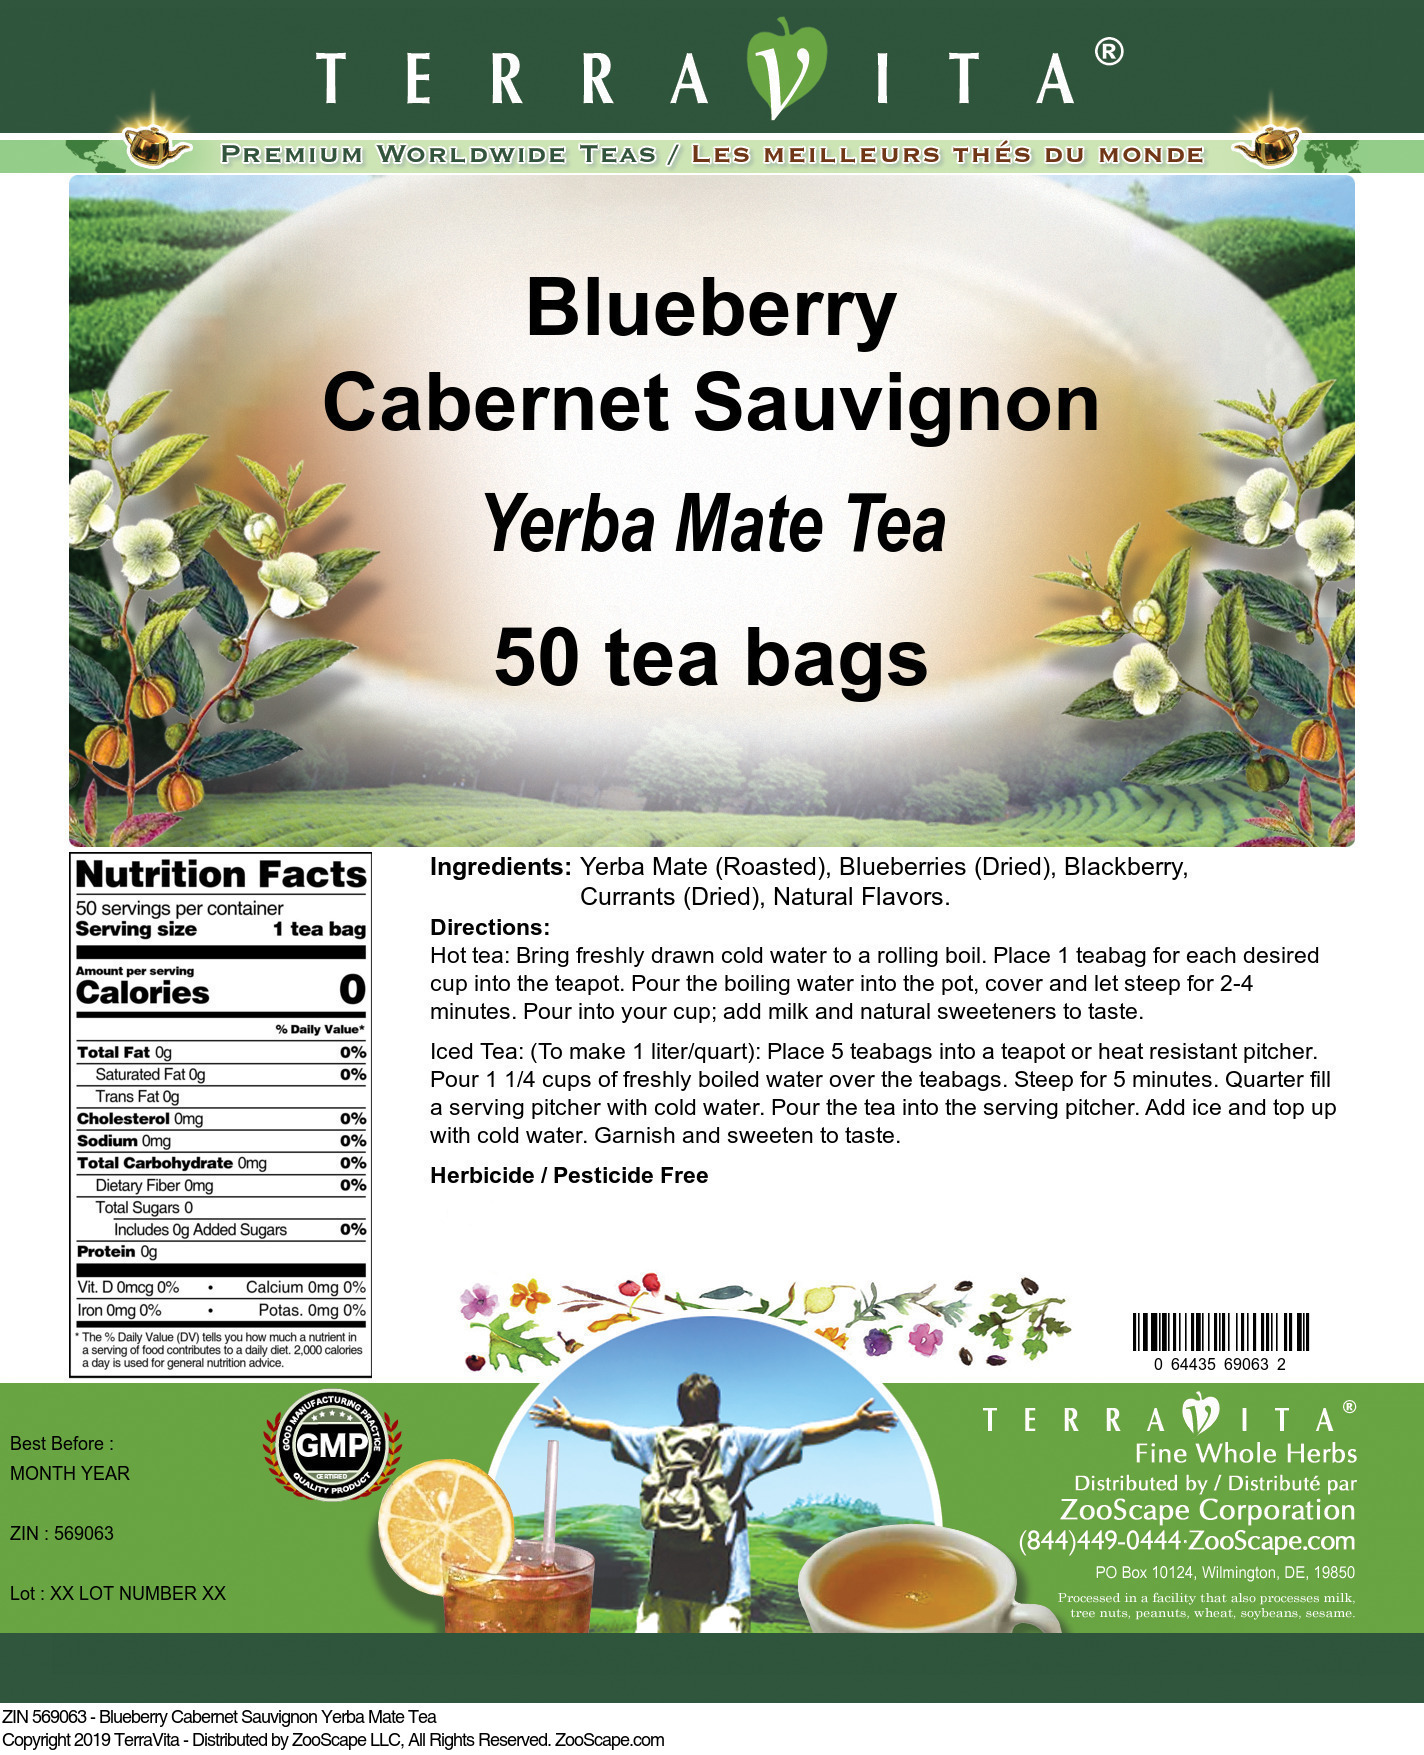 Blueberry Cabernet Sauvignon Yerba Mate